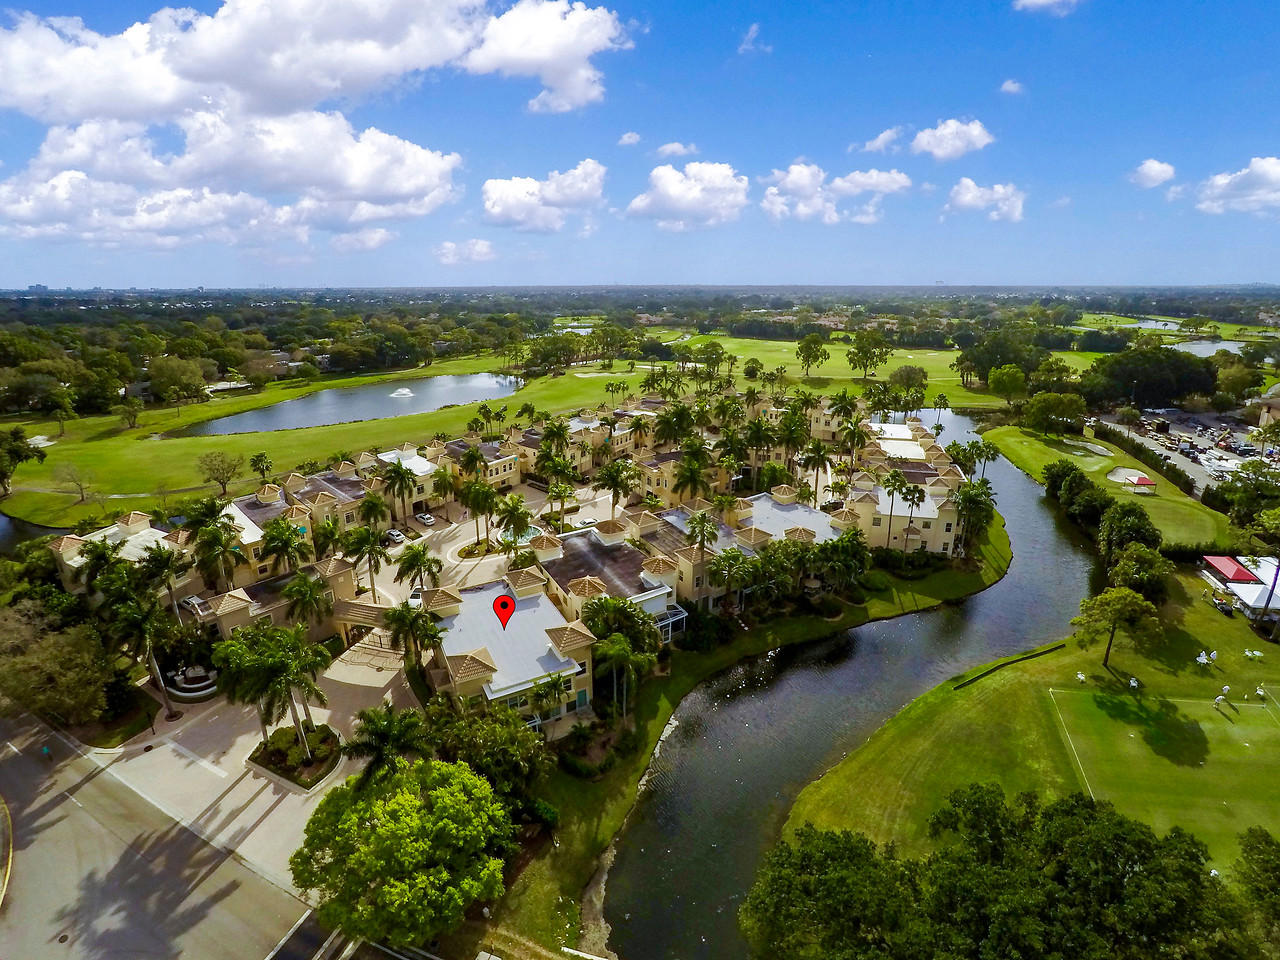 507 Resort Lane, Palm Beach Gardens, Florida 33418, 3 Bedrooms Bedrooms, ,3 BathroomsBathrooms,A,Townhouse,Resort,RX-10617105